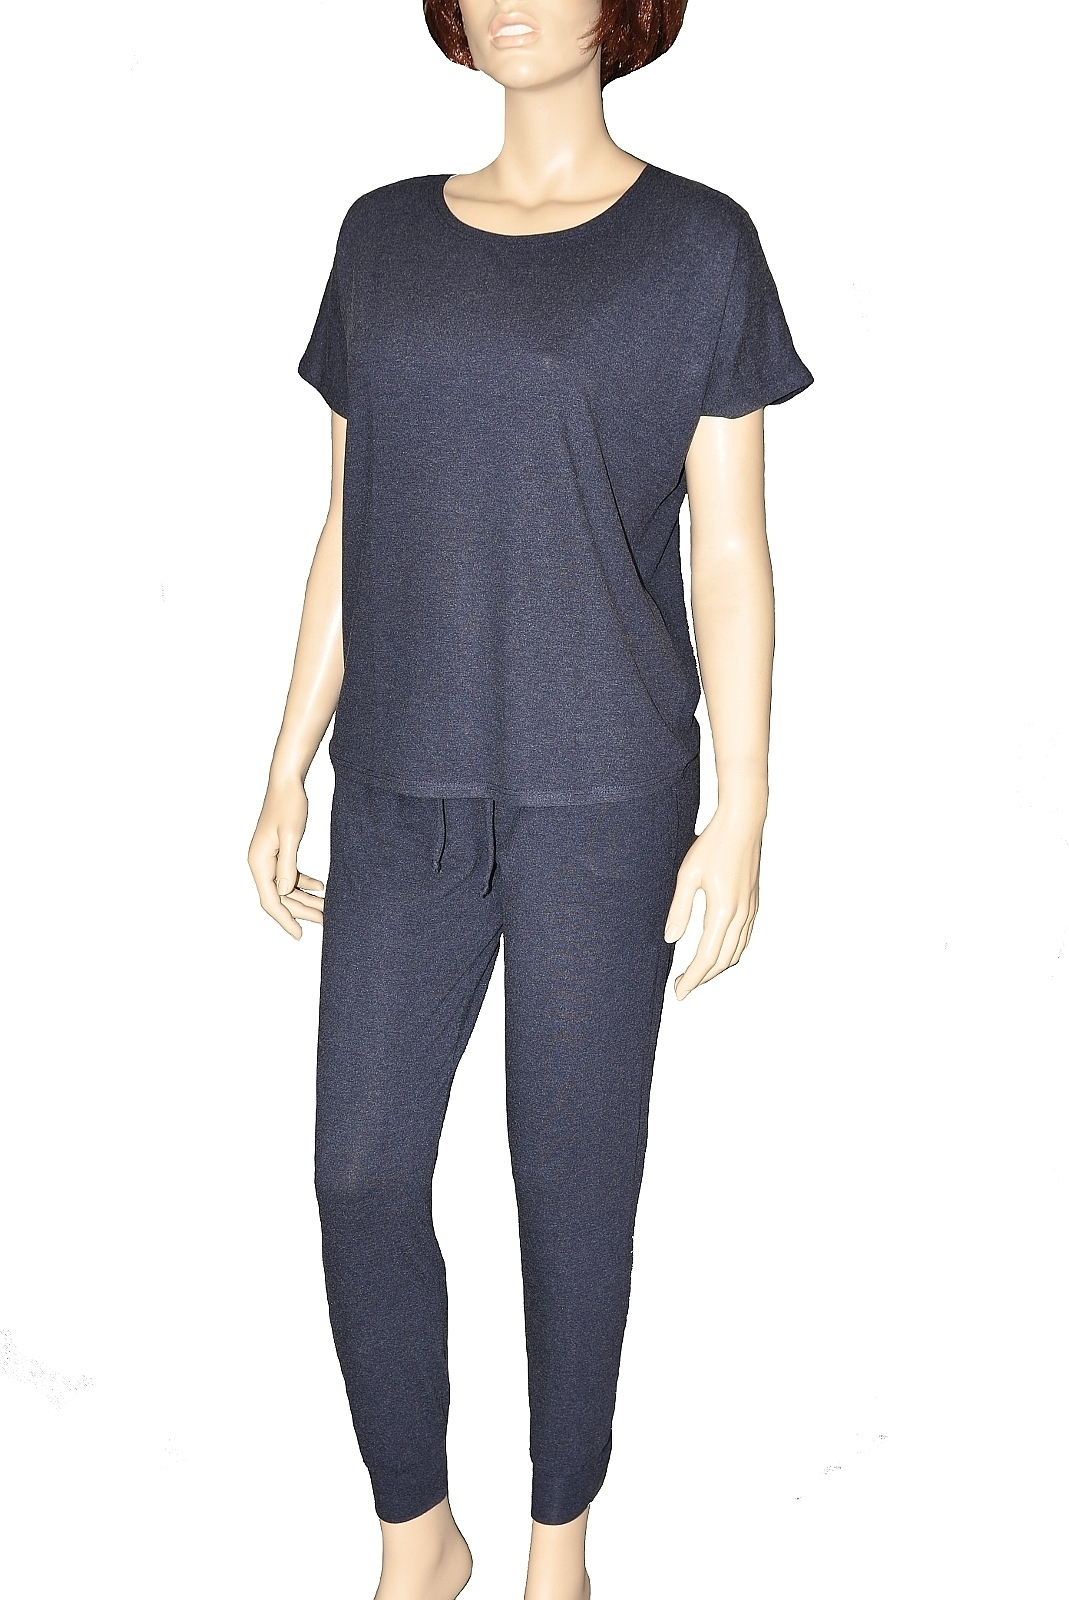 Dámské pyžamo De Lafanse Paula 524 malinová XL